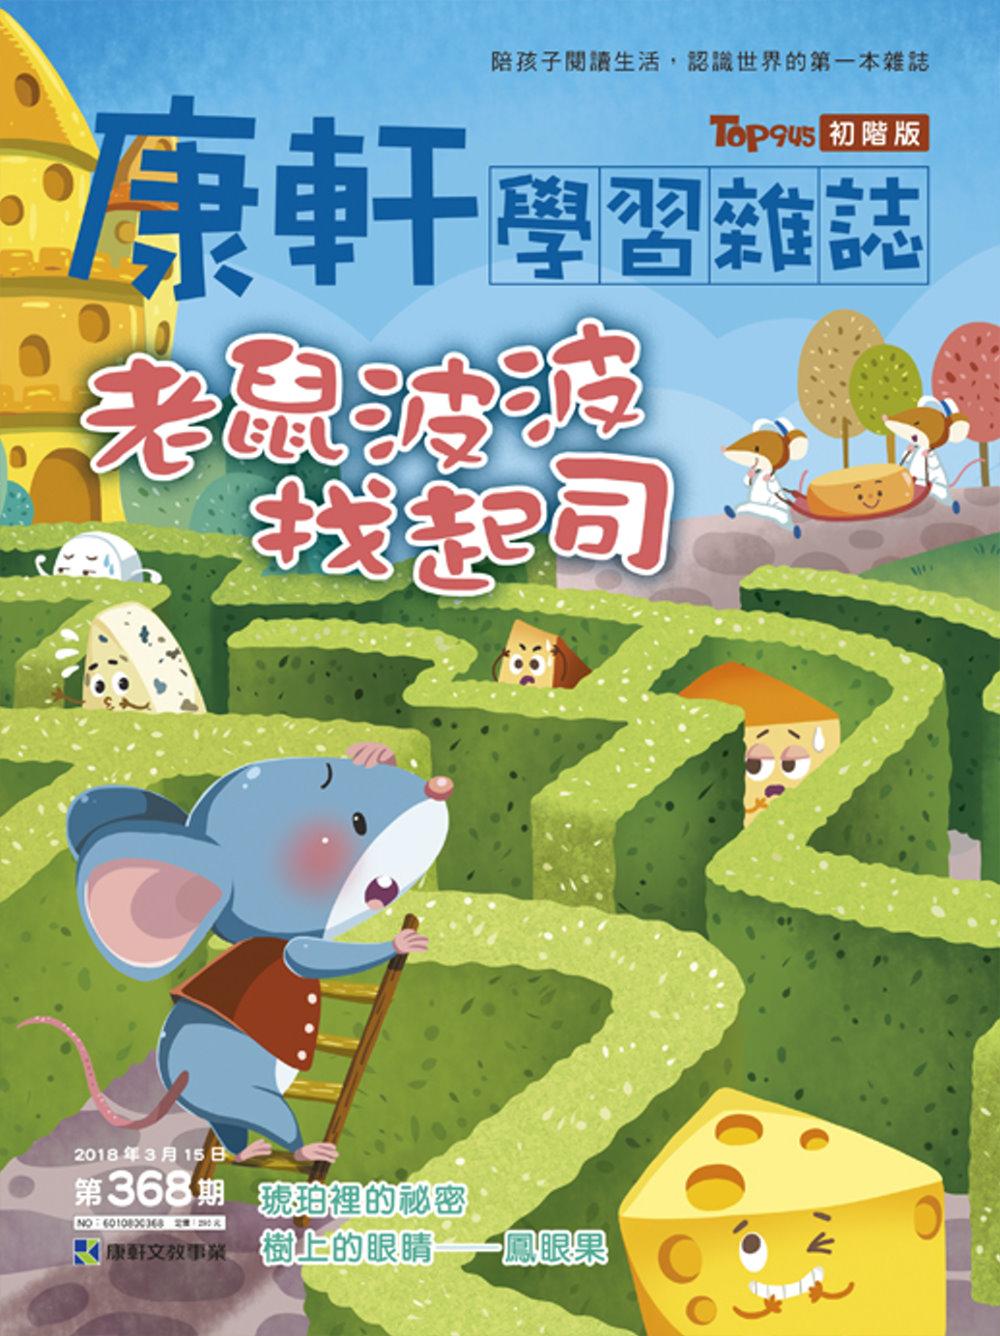 Top945兒童學習初階版 2018/3/15第368期